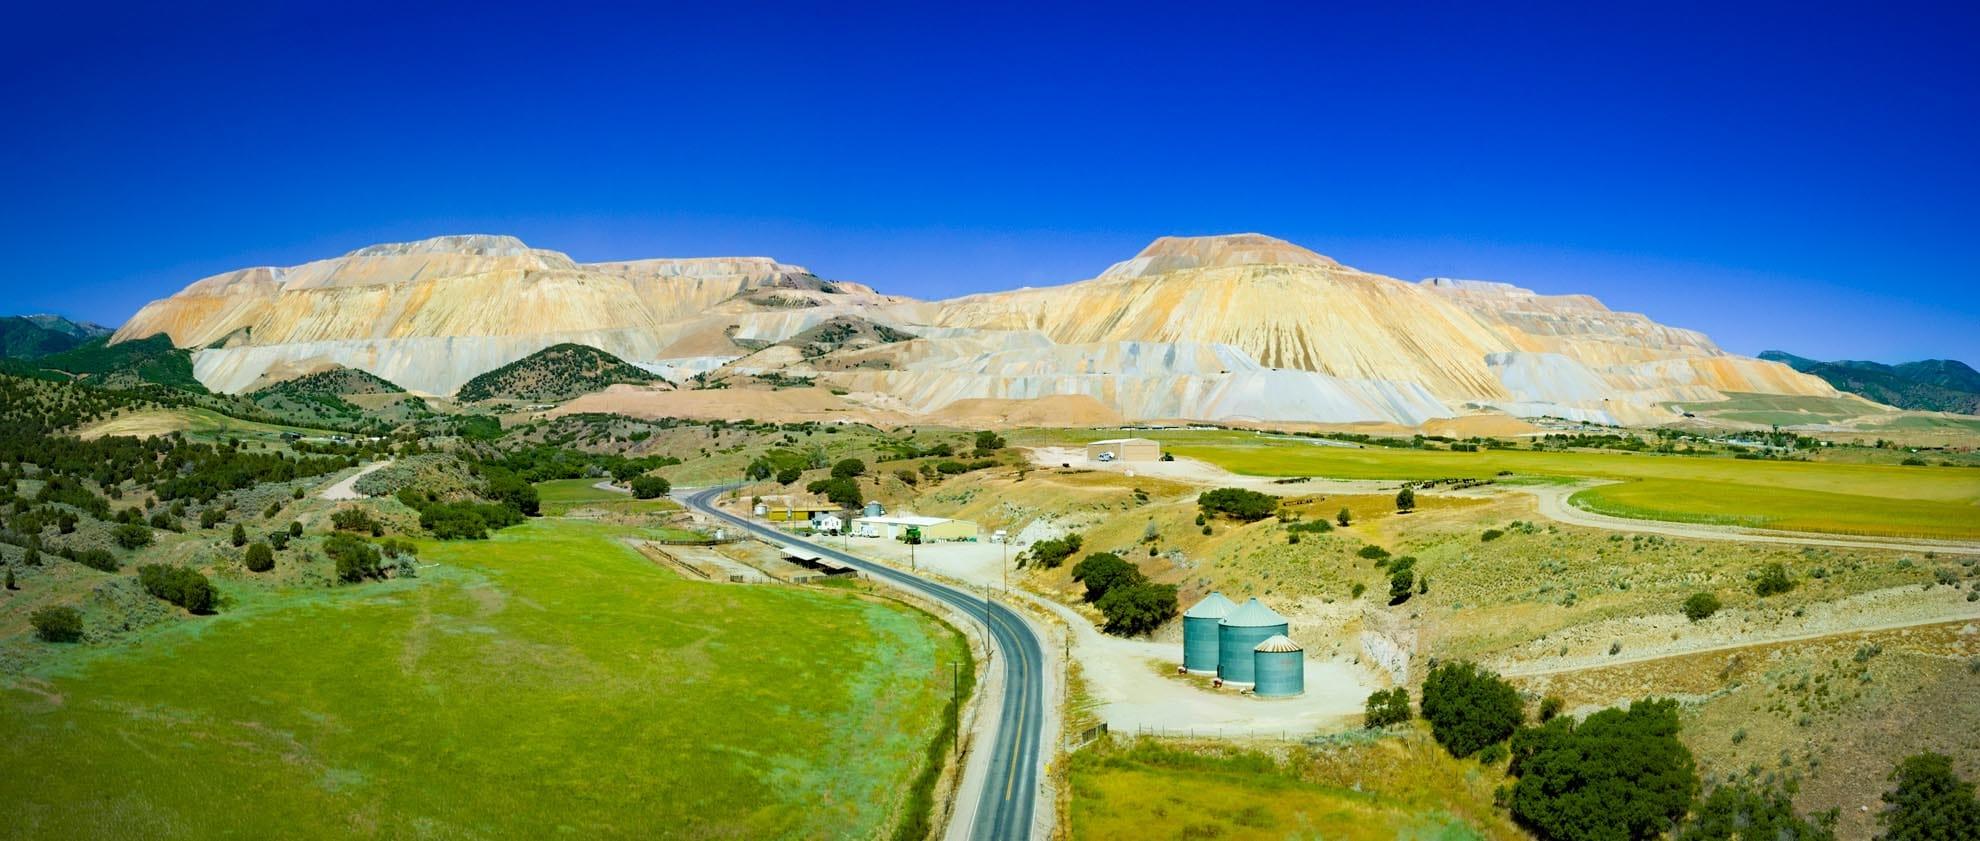 Drone Photograph of Bingham Canyon Mine Utah